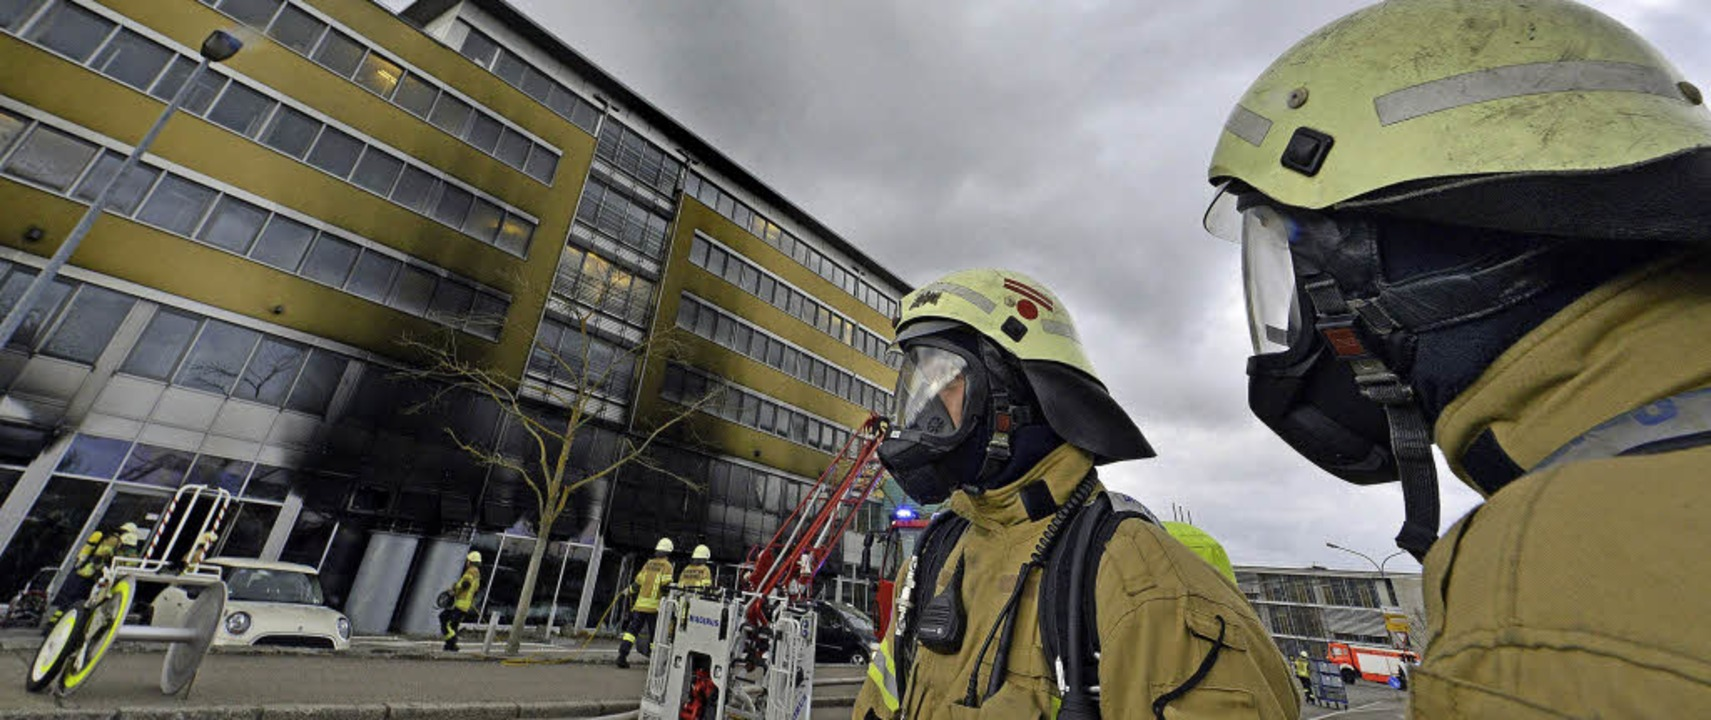 Vier Feuerwehrmänner verletzten sich t...z im Solar-Center an der Neuen Messe.   | Foto: Michael Bamberger